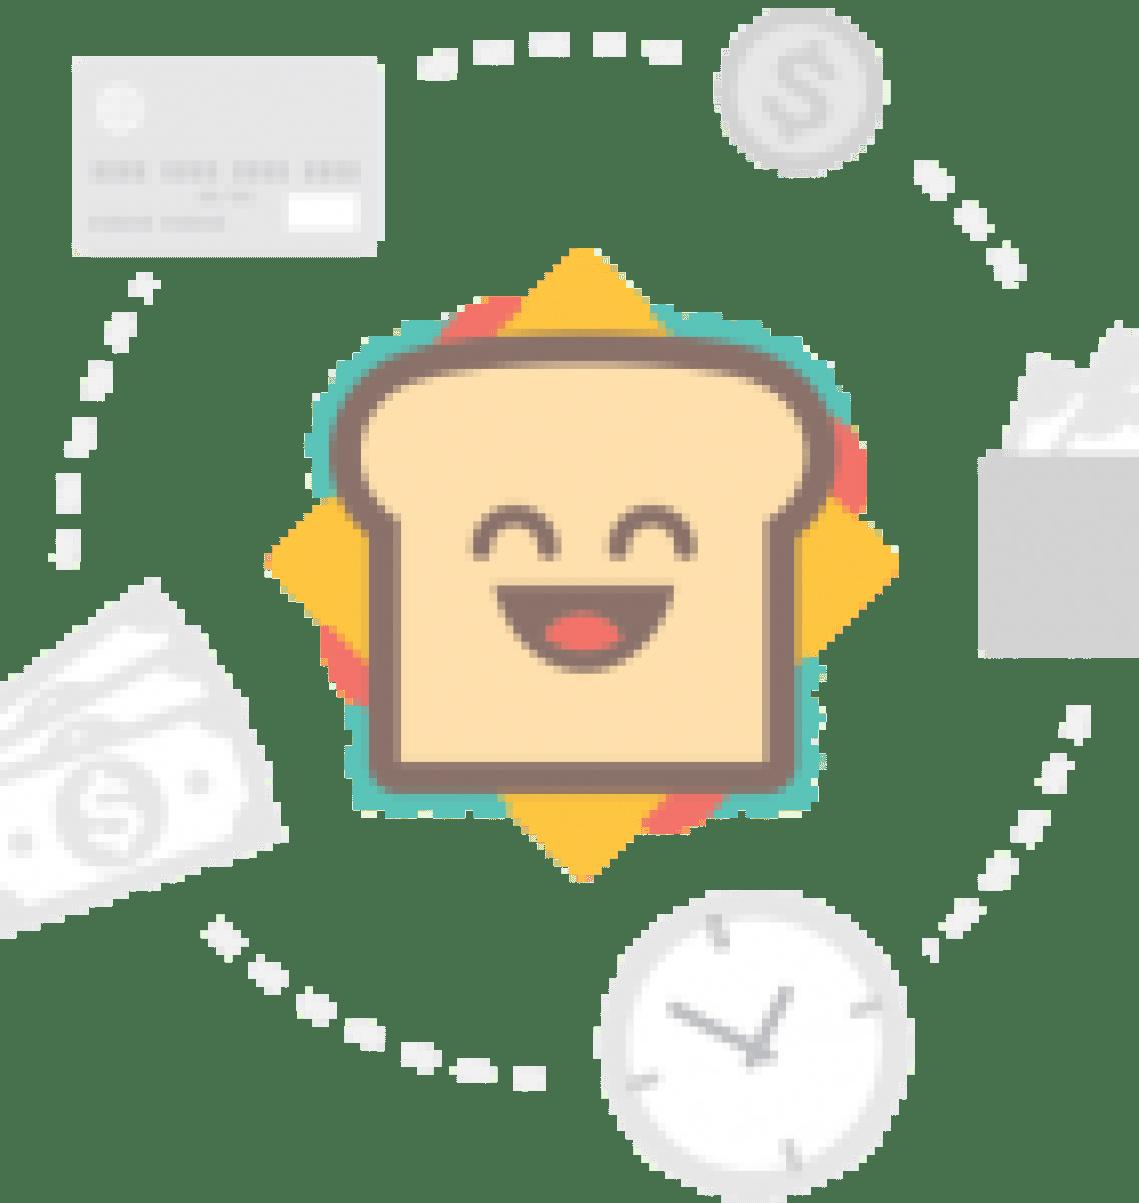 -karolina kurkova met gala 2016 marchesa dress